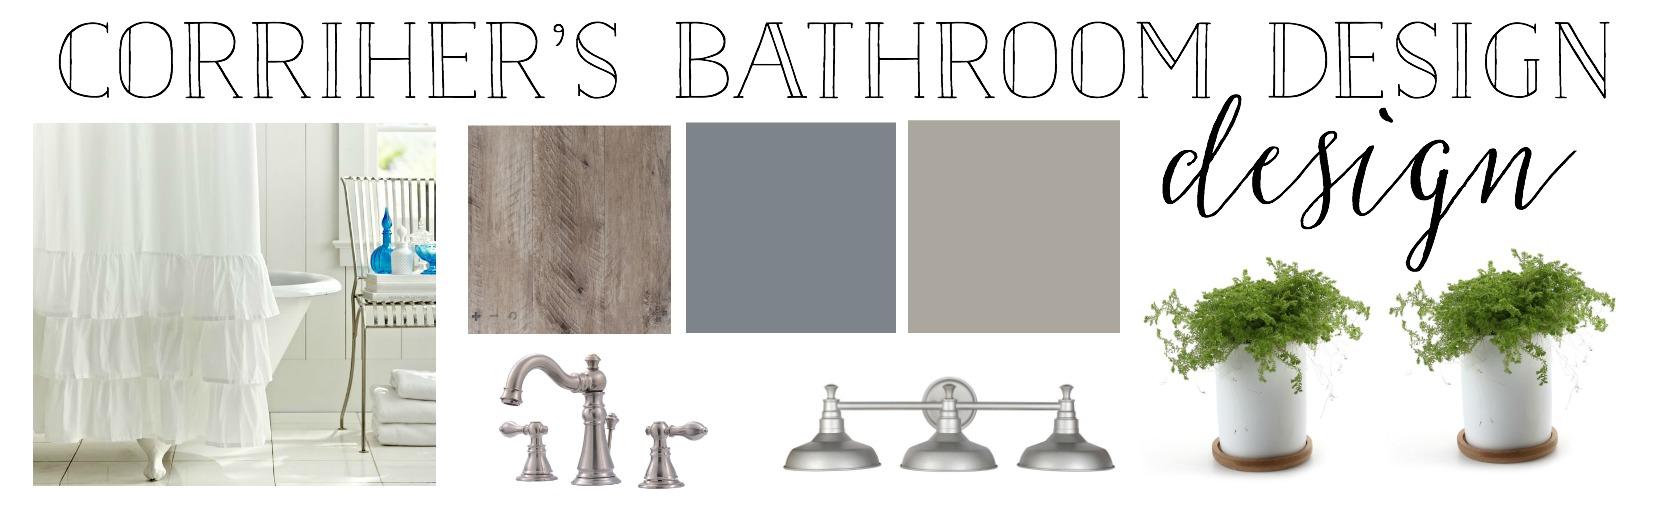 The Simple Abode's Interior Design Project- Bathroom Design- By Plum Pretty Decor and Design